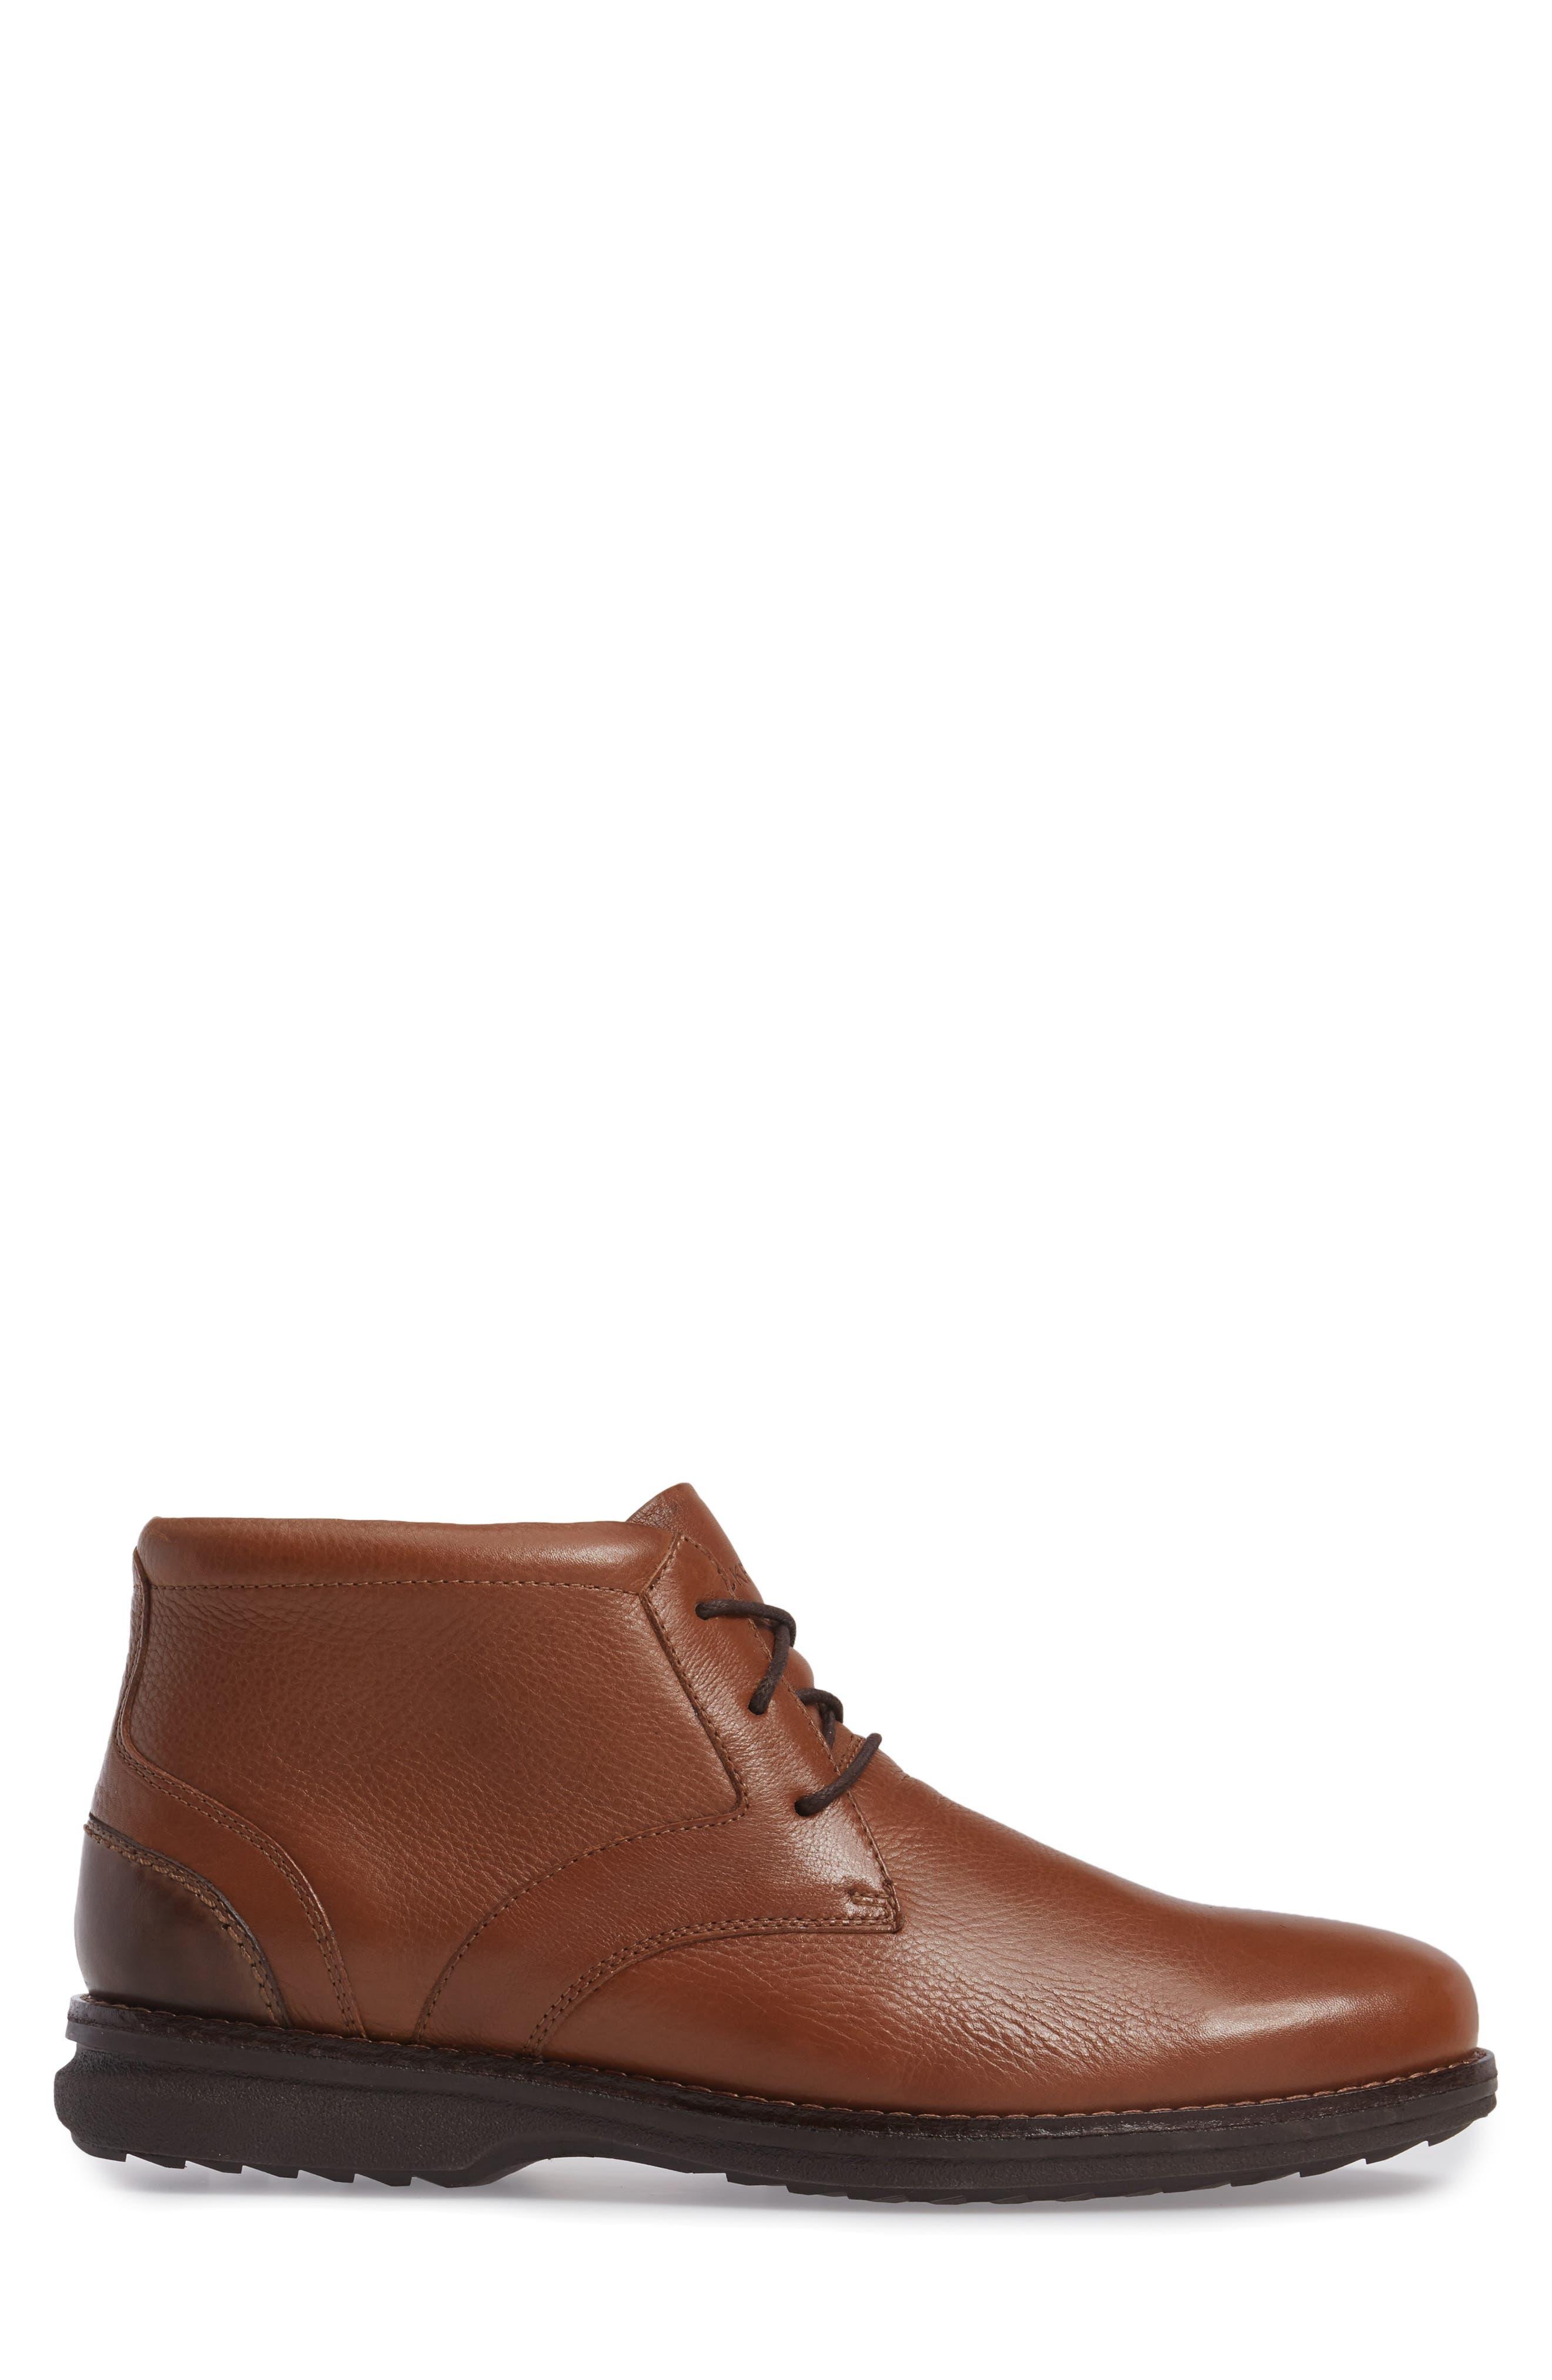 Premium Class Chukka Boot,                             Alternate thumbnail 6, color,